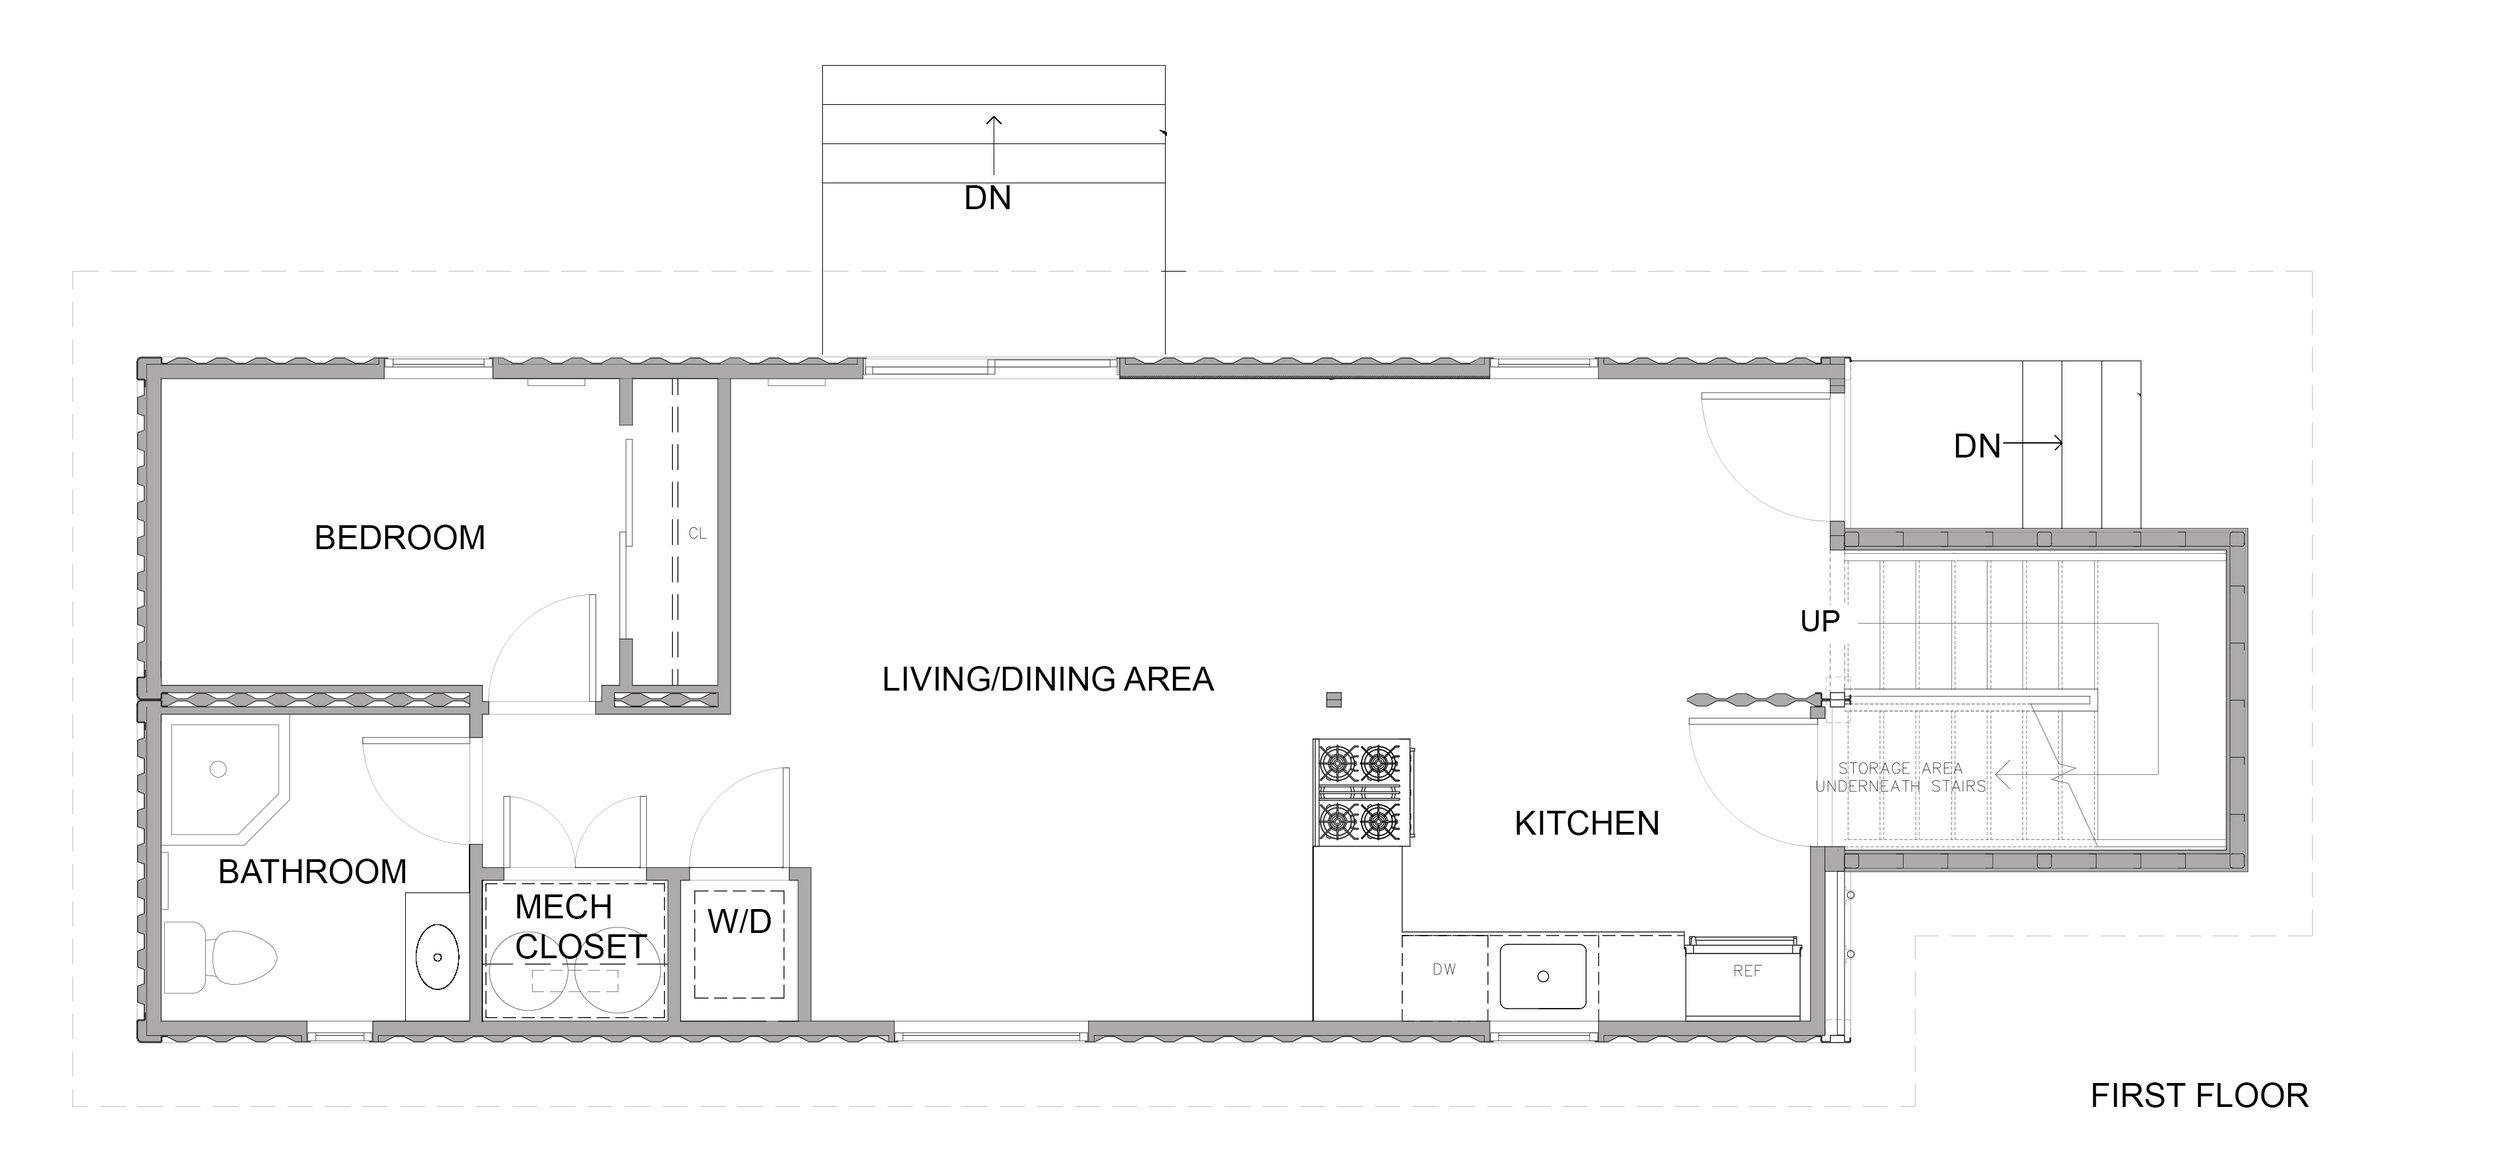 _First Floor Plan for website-R01.jpg